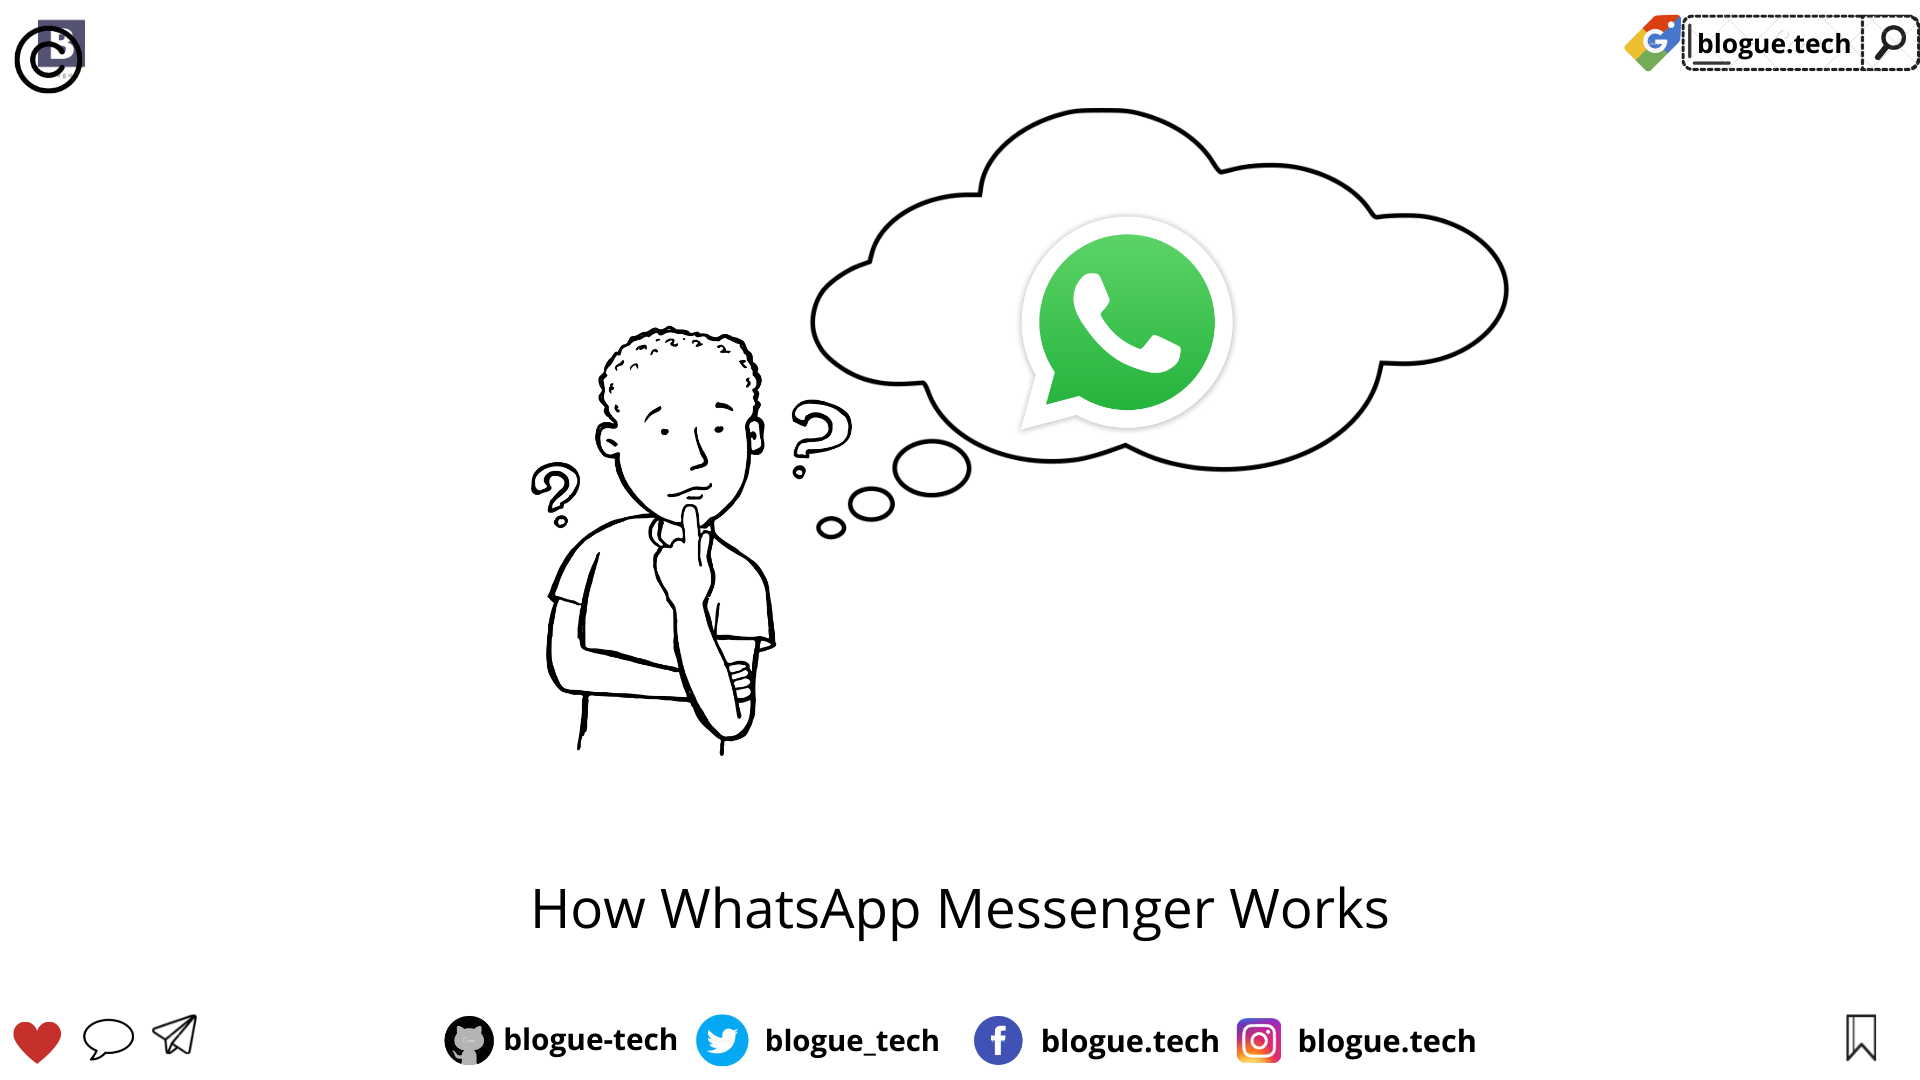 How WhatsApp Messenger Works